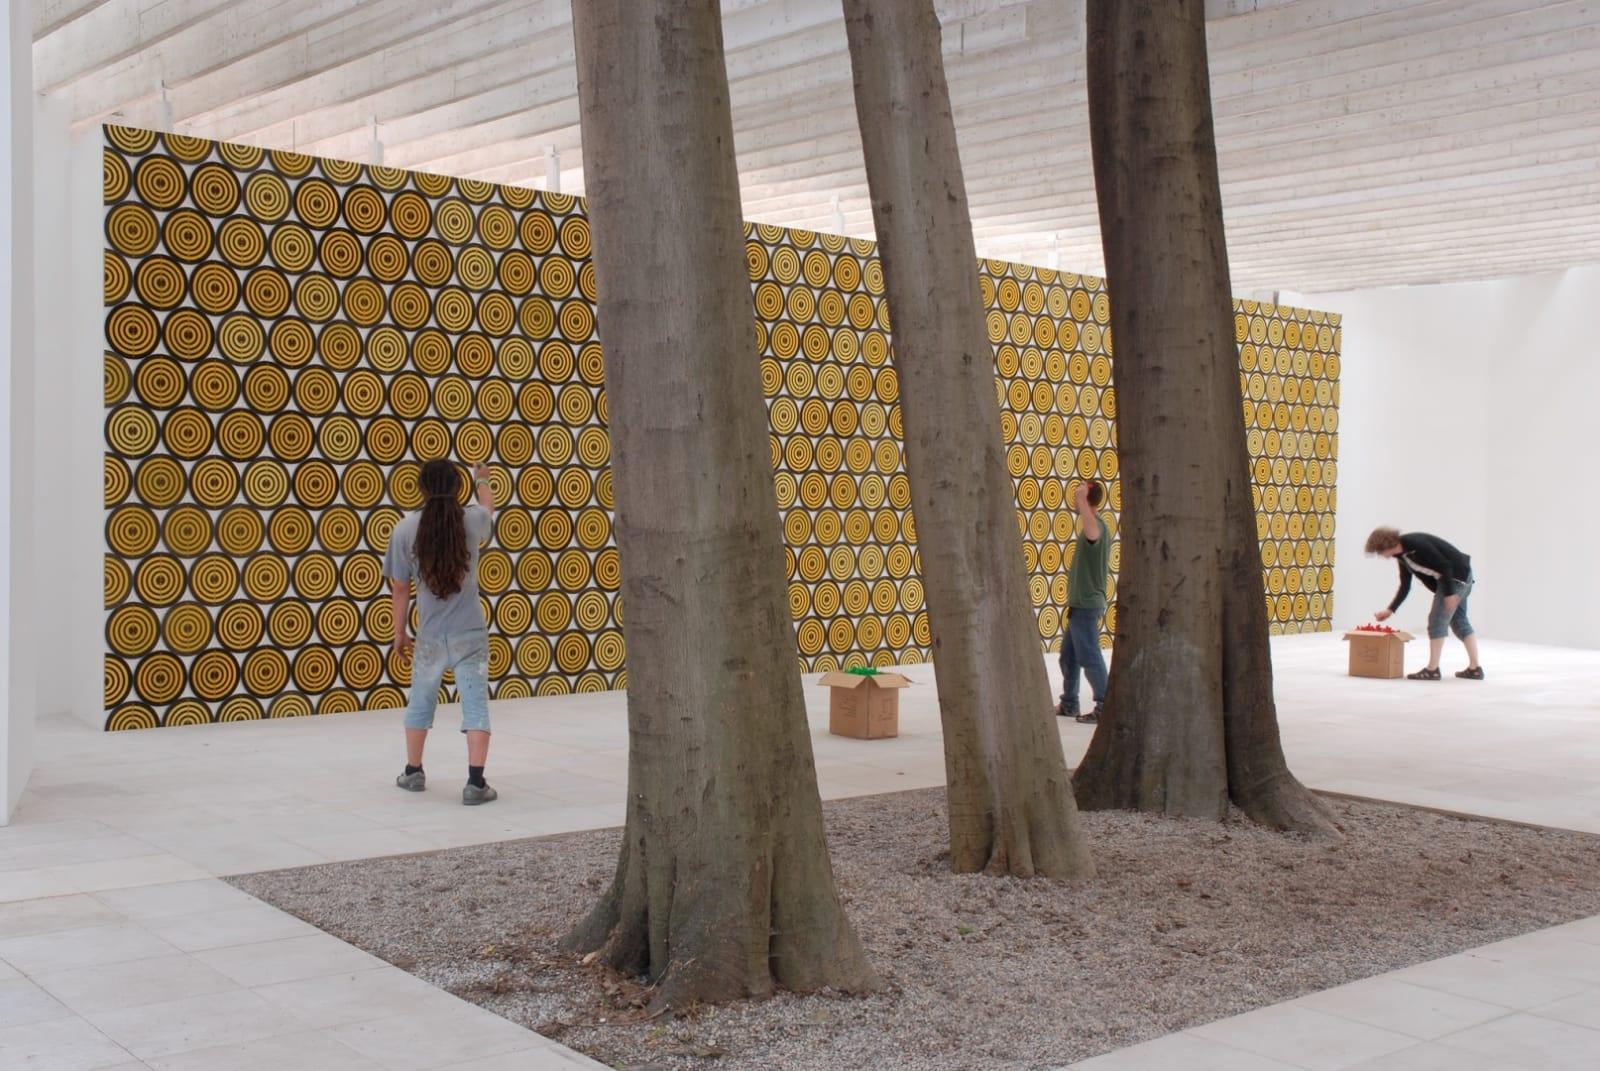 Jacob Dahlgren I, the World, Things, Life Installation view, 52nd Venice Biennale, The Nordic Pavillion, 2007